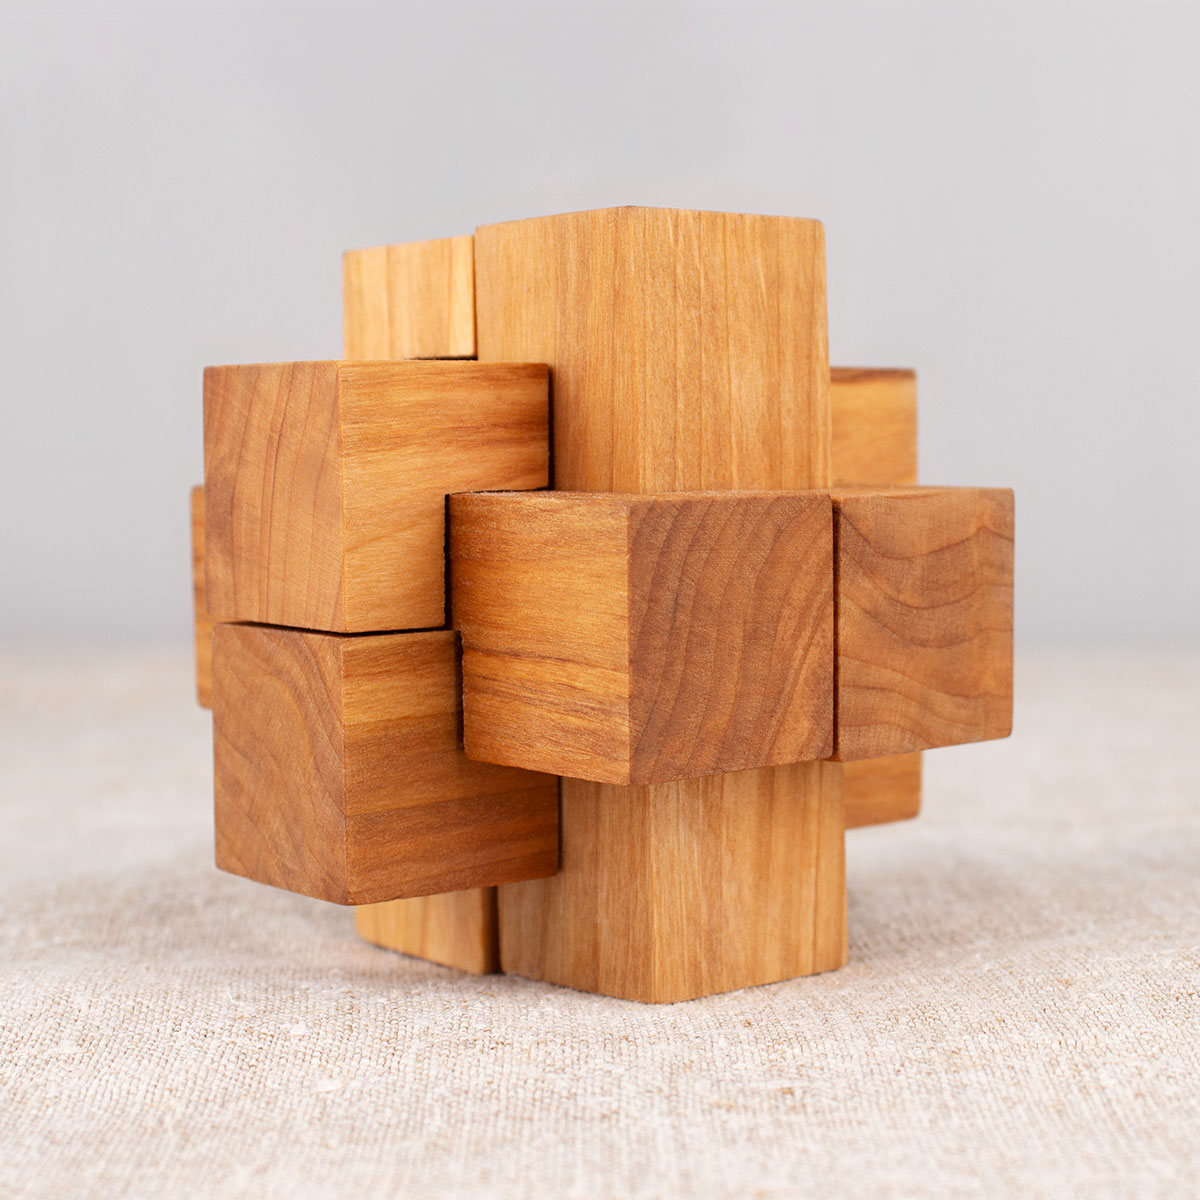 Wooden Cross Puzzle